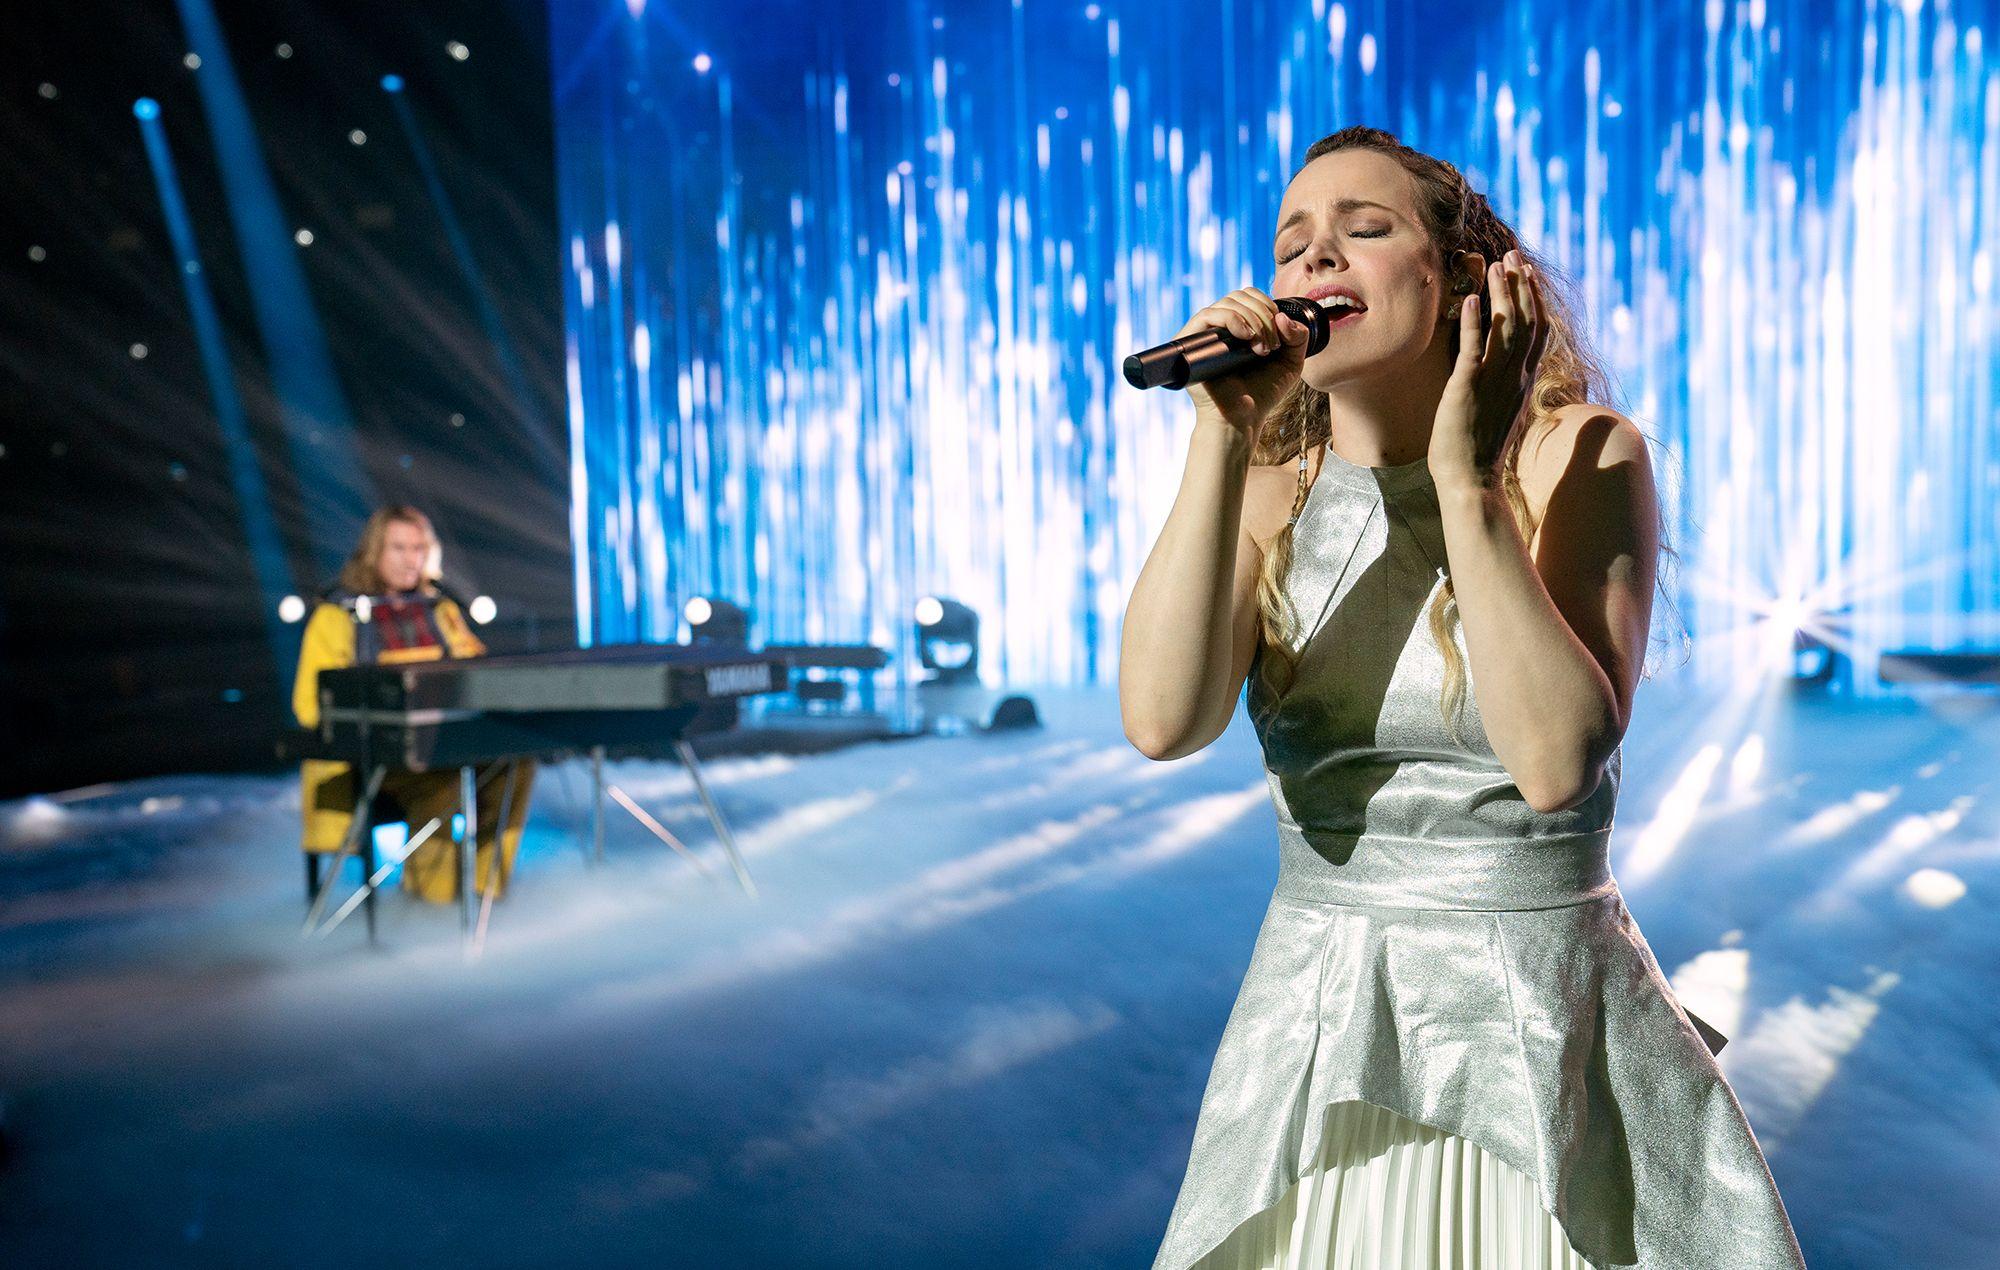 Todo sobre la película de Eurovisión